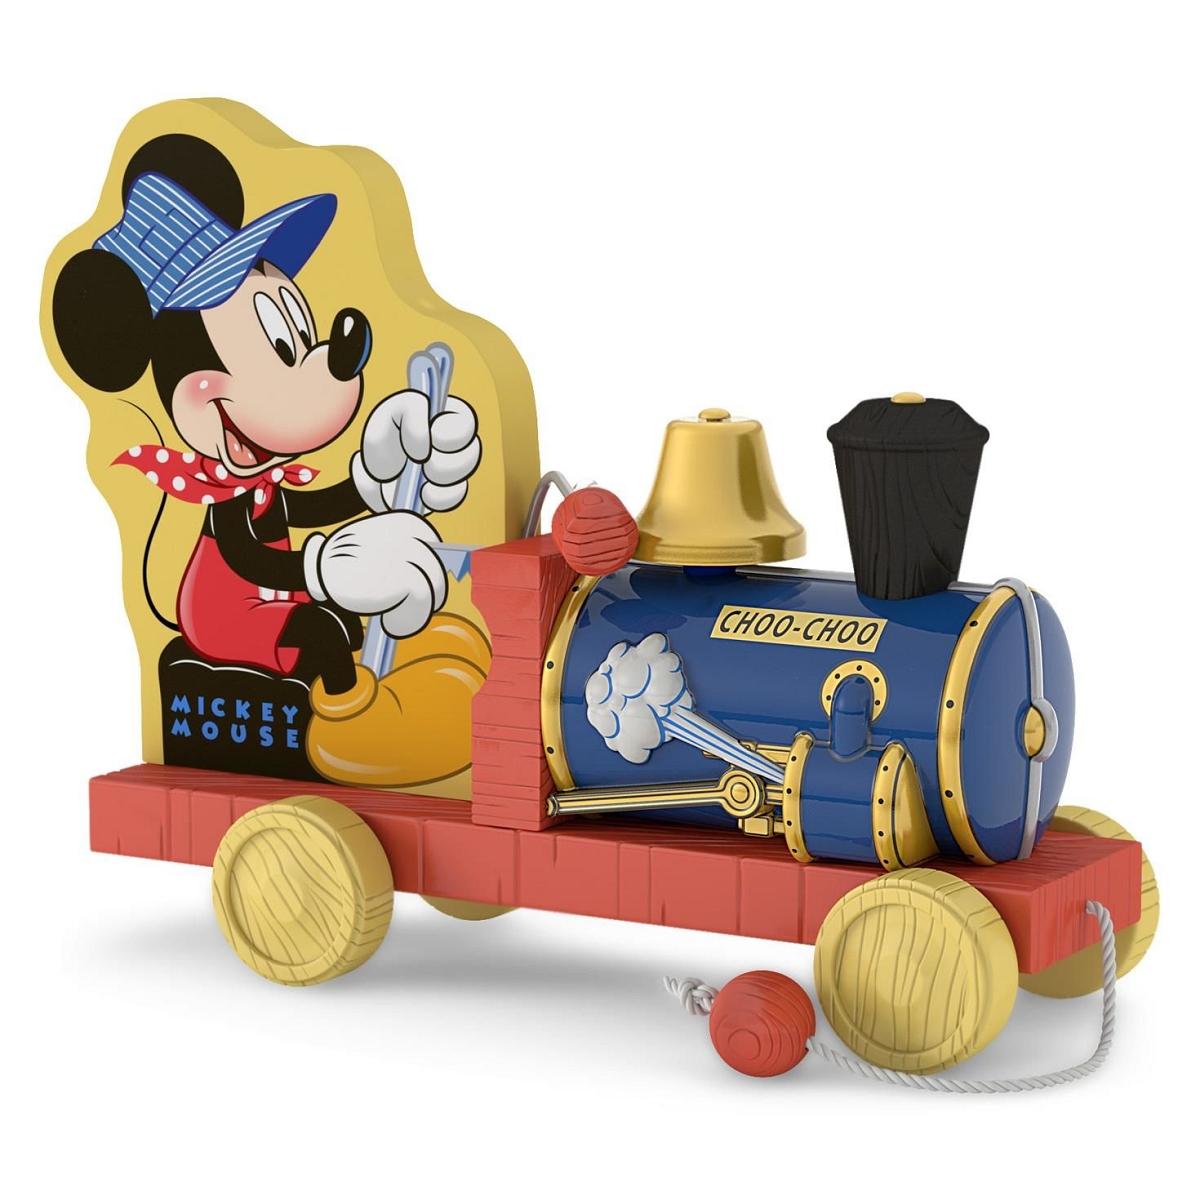 2016 choo choo mickey hallmark keepsake ornament hooked for Disney mickey mouse motorized choo choo train with tracks